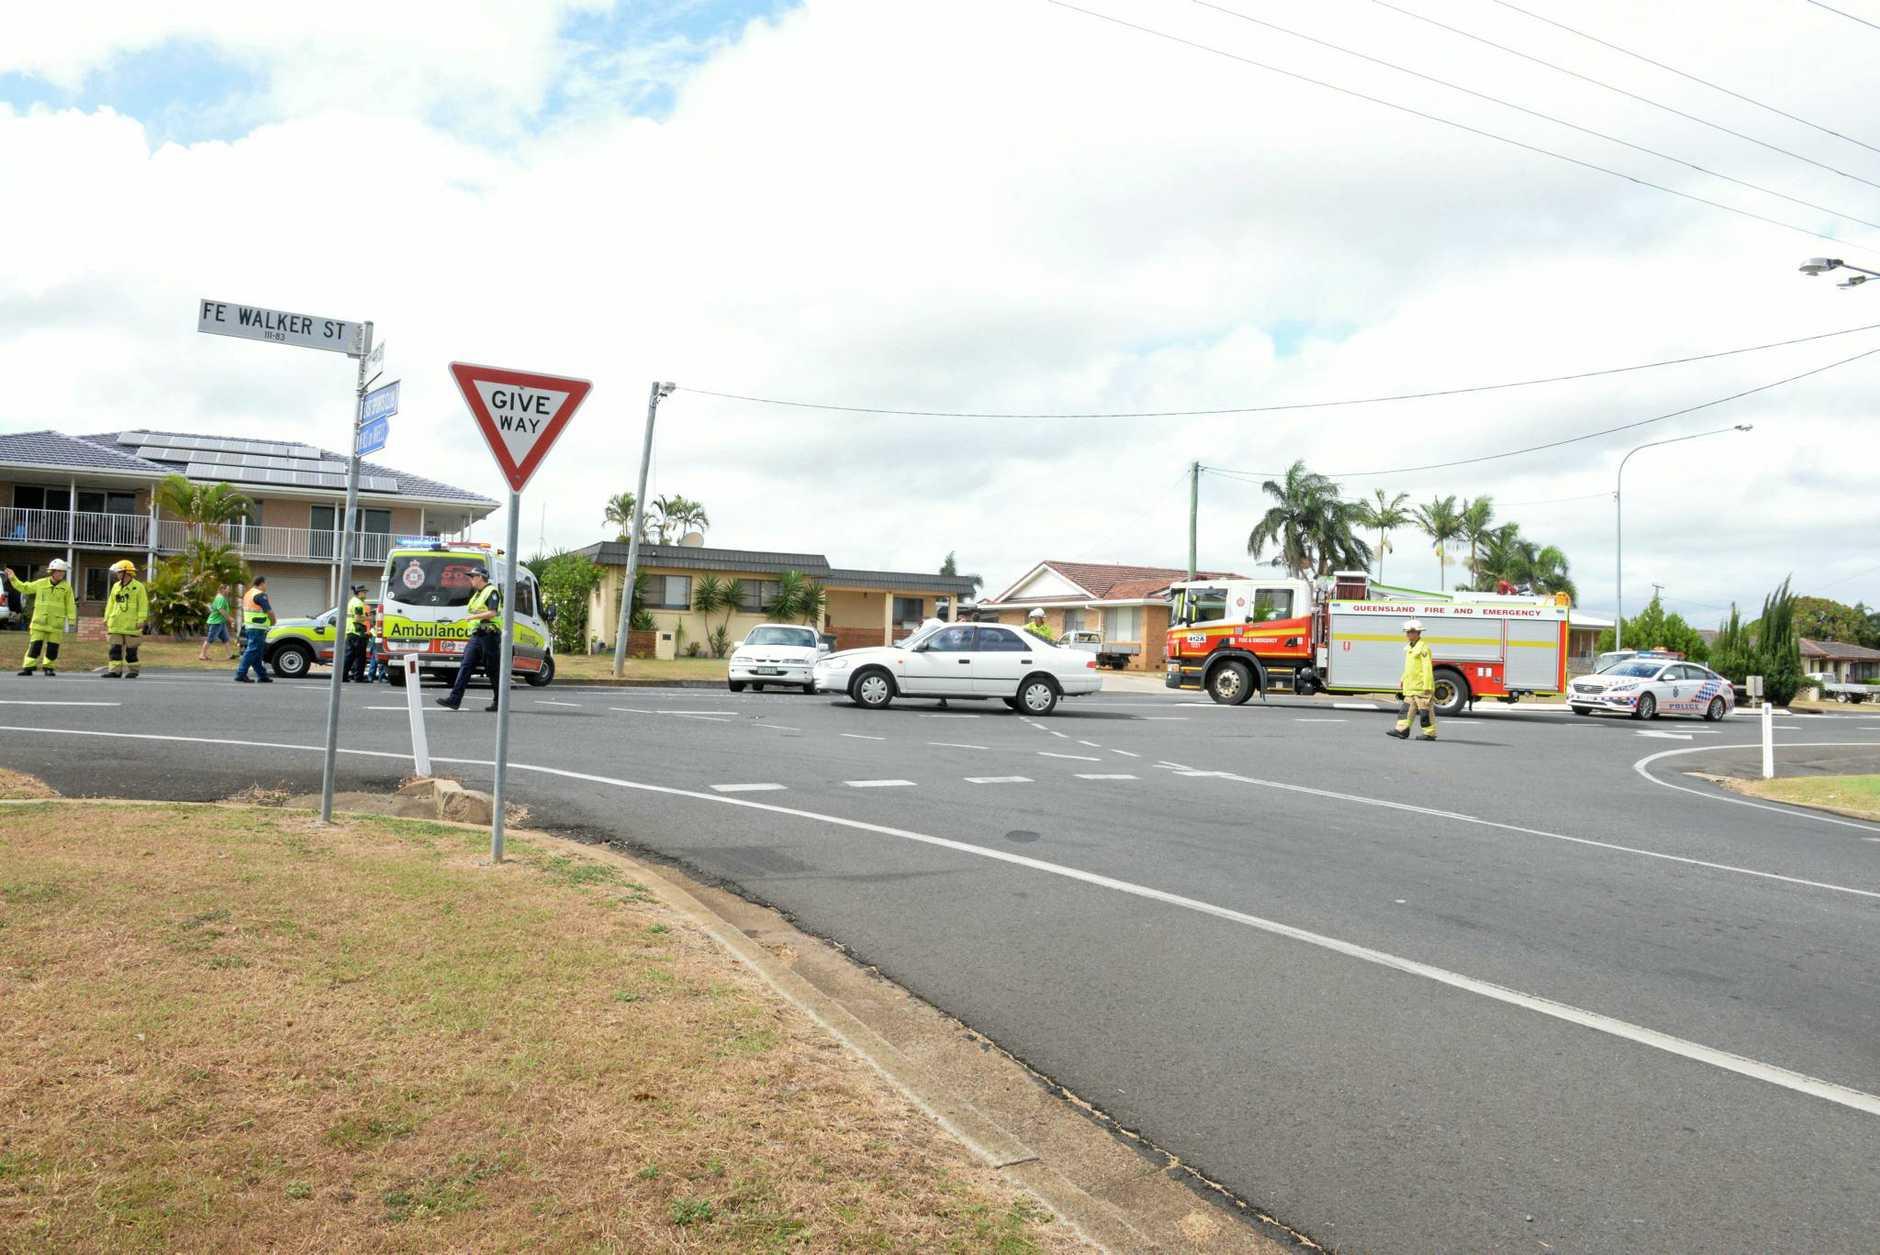 Emergency crews at the scene of a crash on FE Walker St.